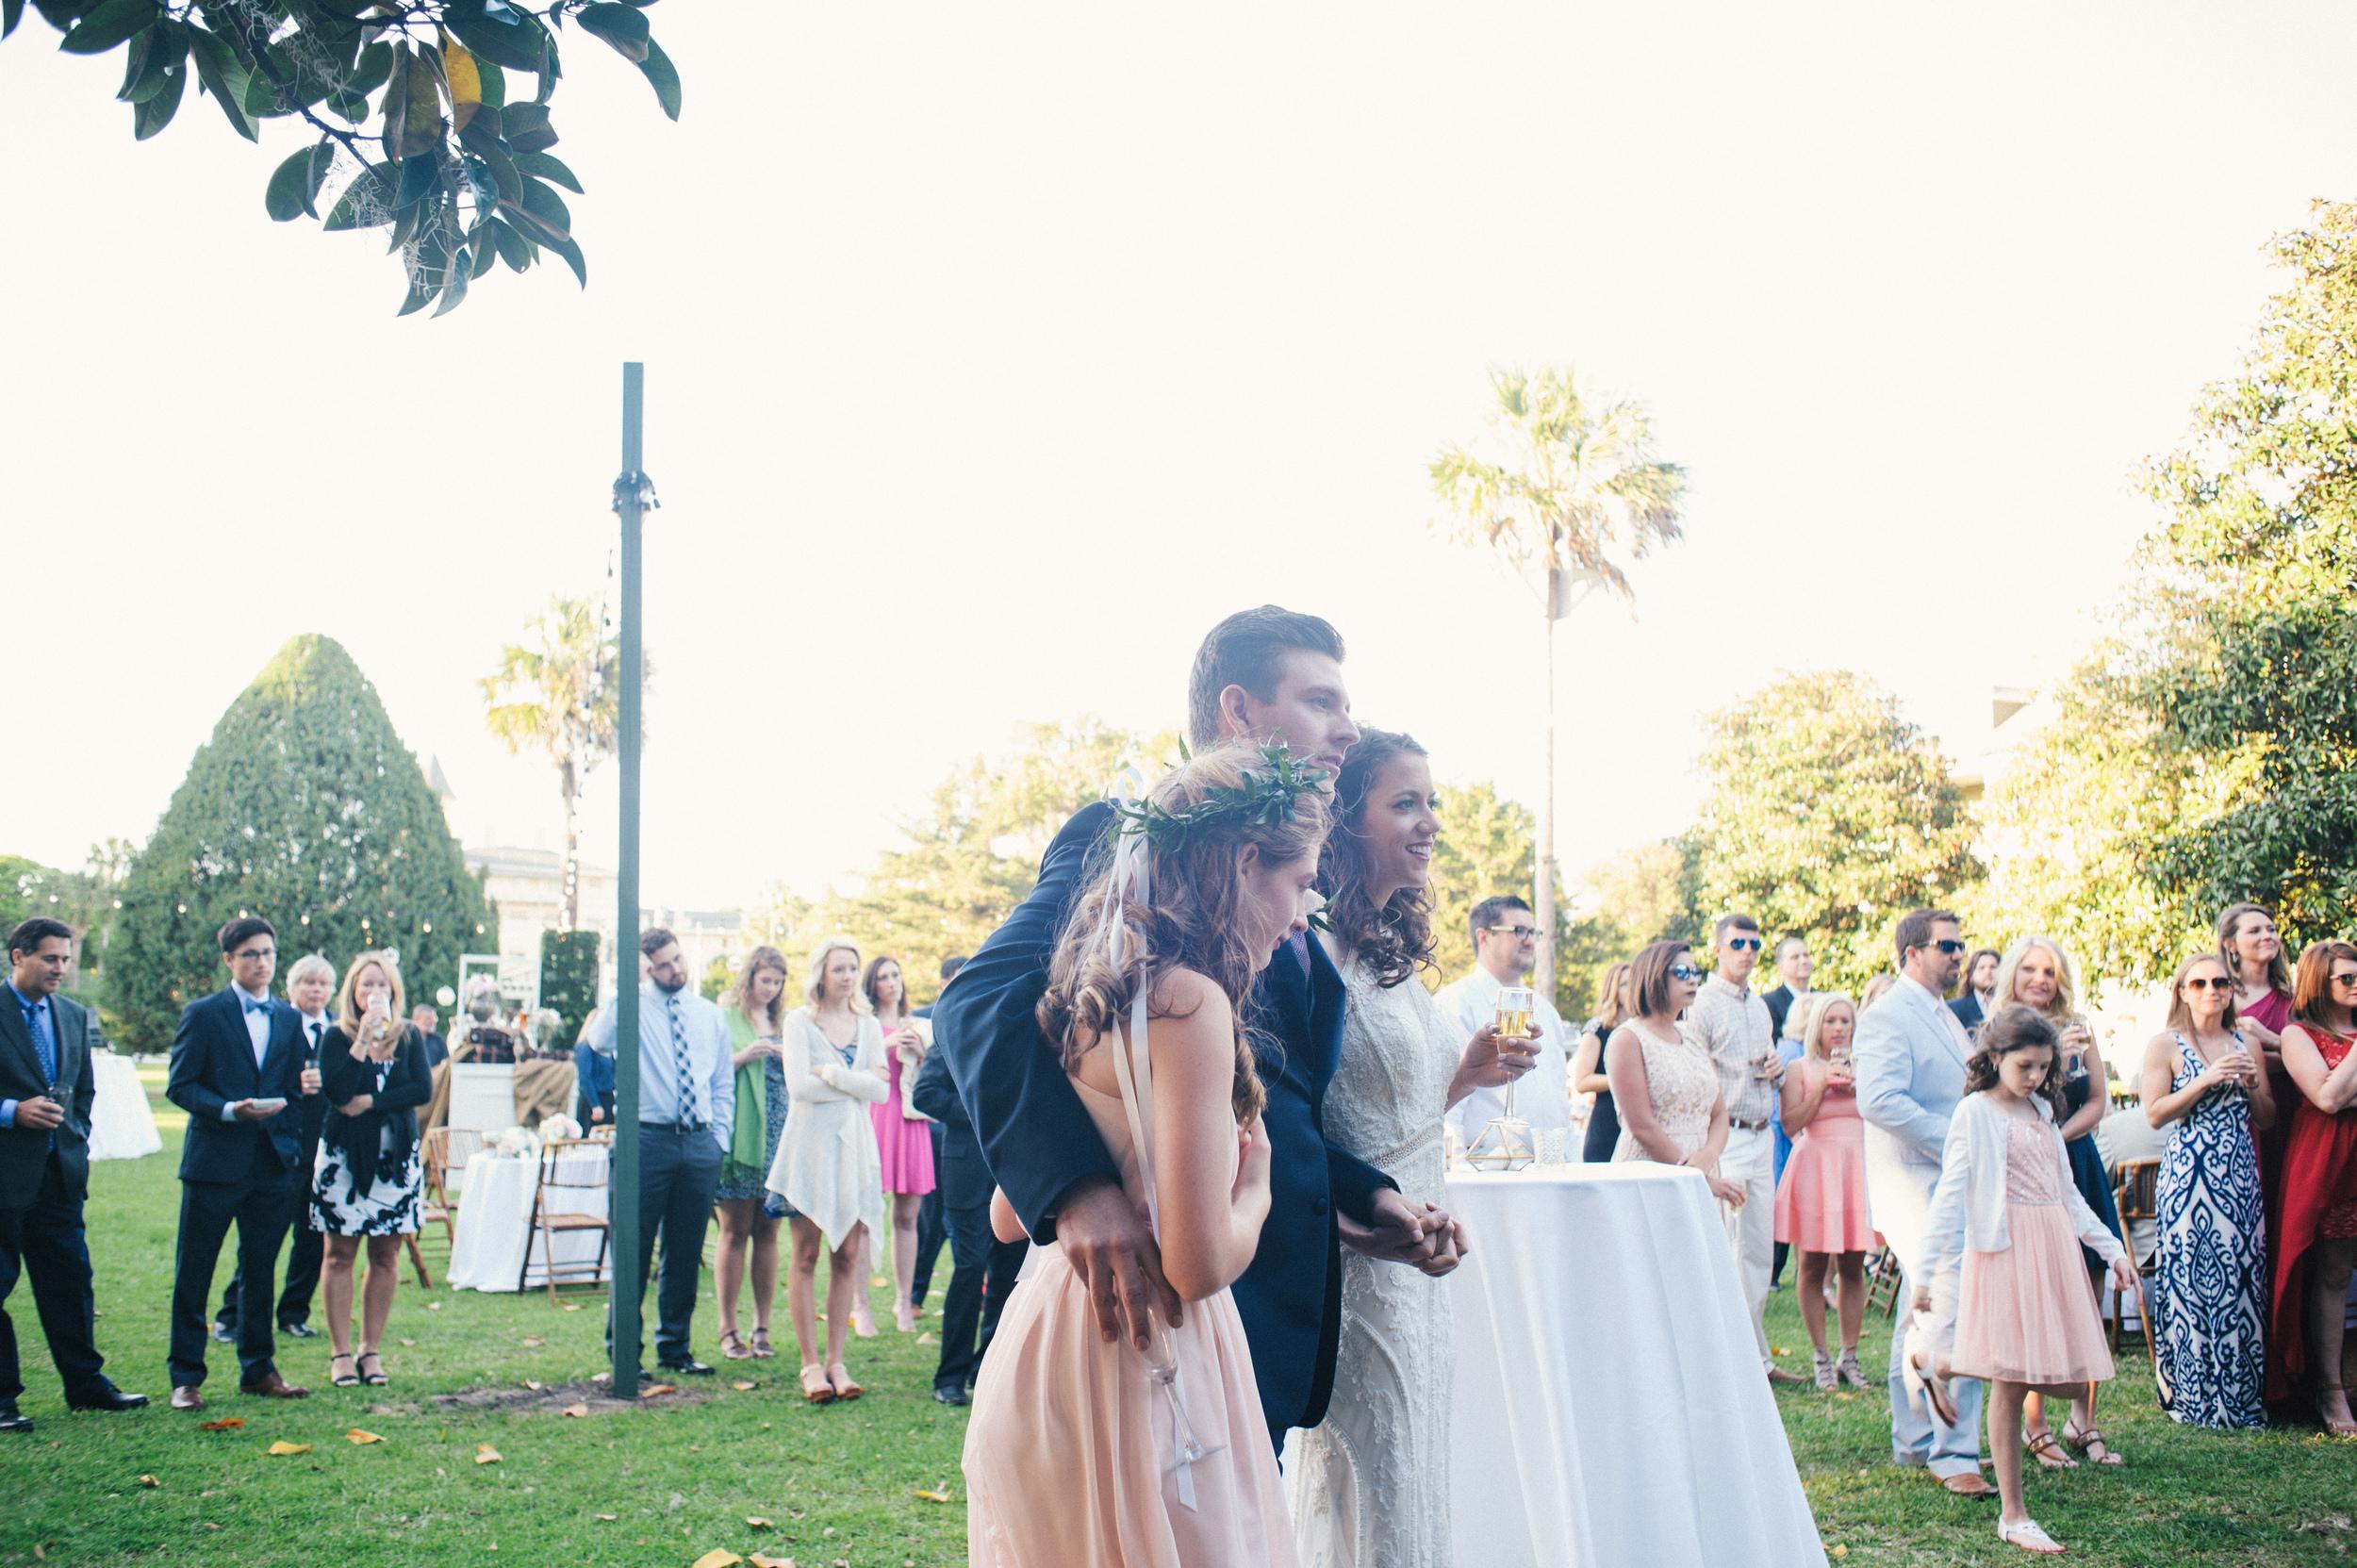 kadi-and-matt-carroll-april-9-2016-jekyl-island-wedding-m-newsom-photography- (592 of 744).jpg